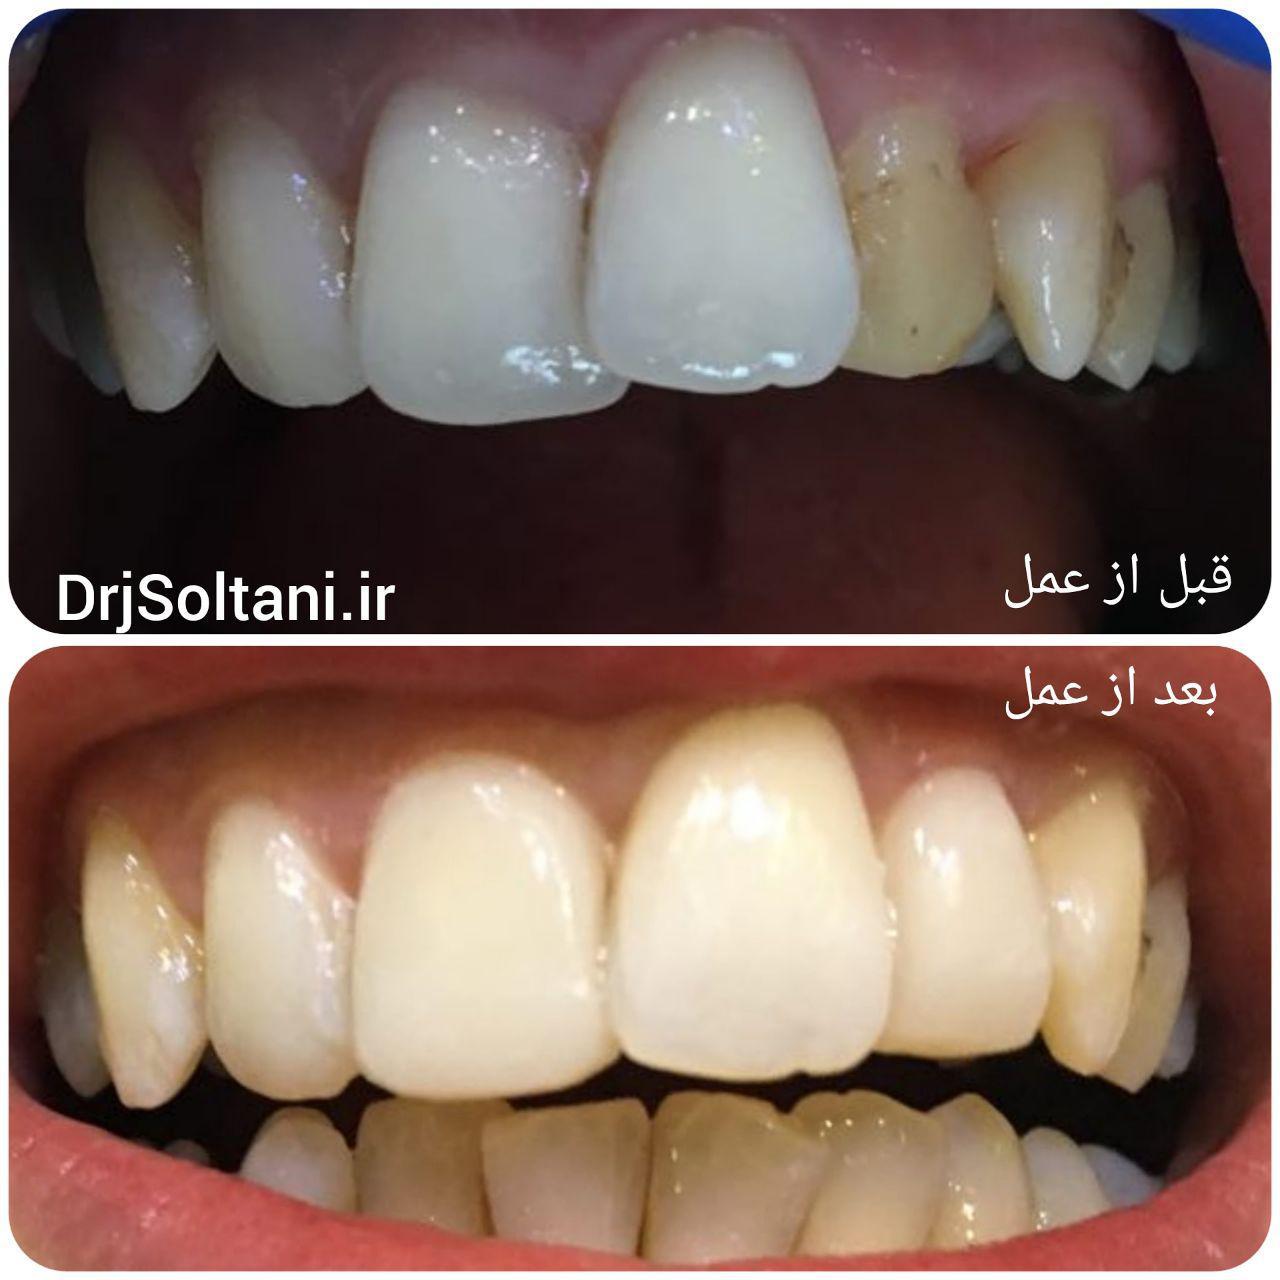 نمونه کار دندانپزشکی